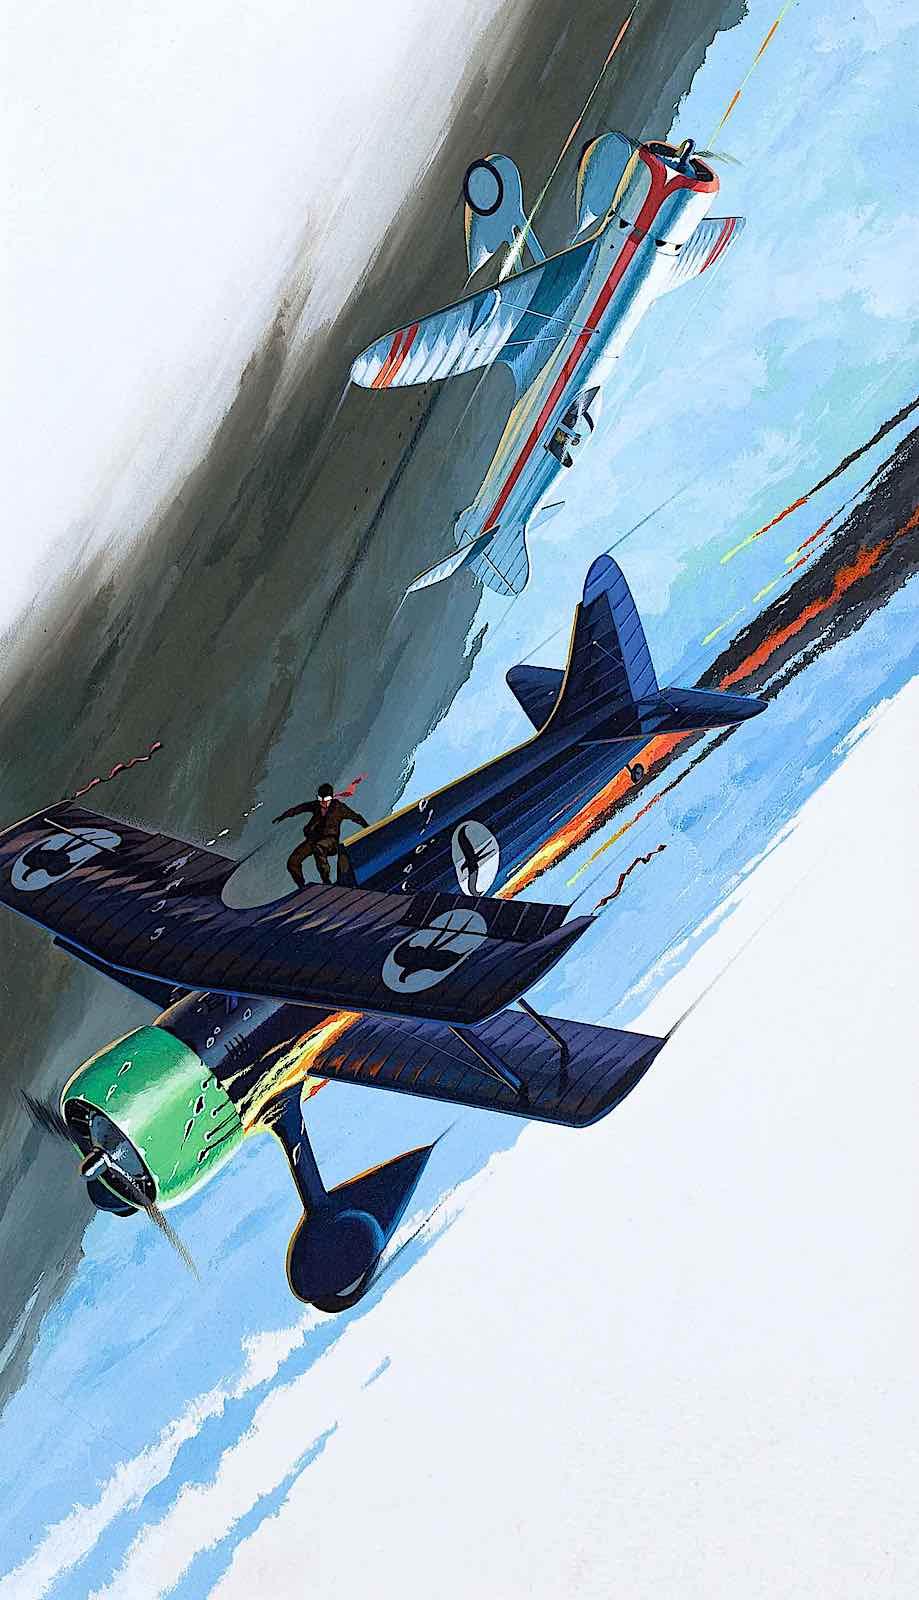 a Jo Kotula illustration of a falling airplane